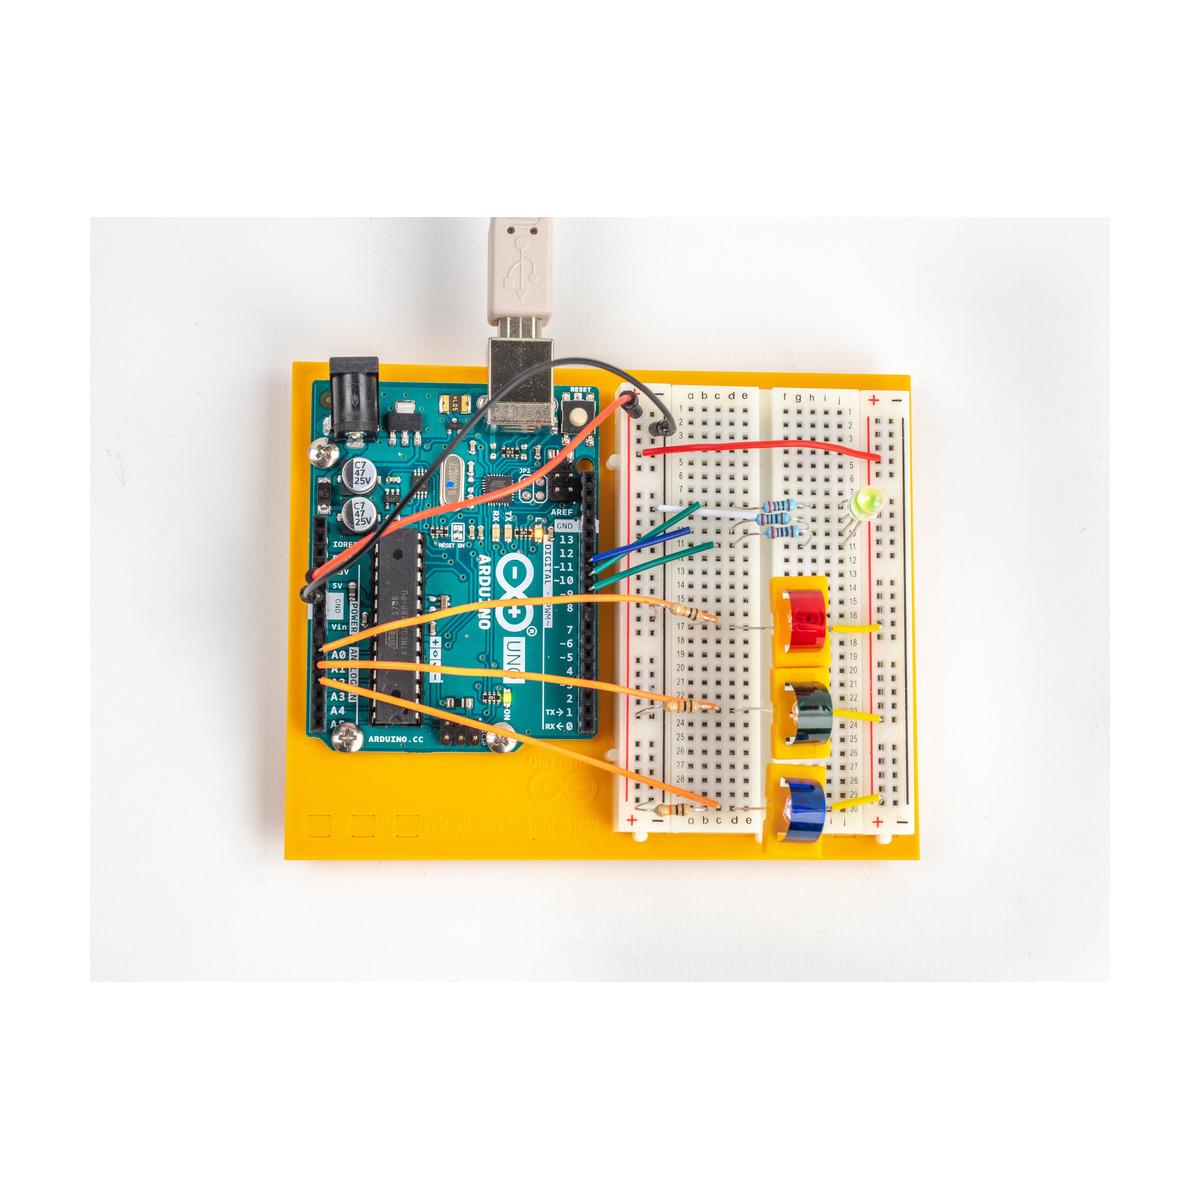 ARDUINO NANO 3.0 MIKROKONTROLLER Power.no